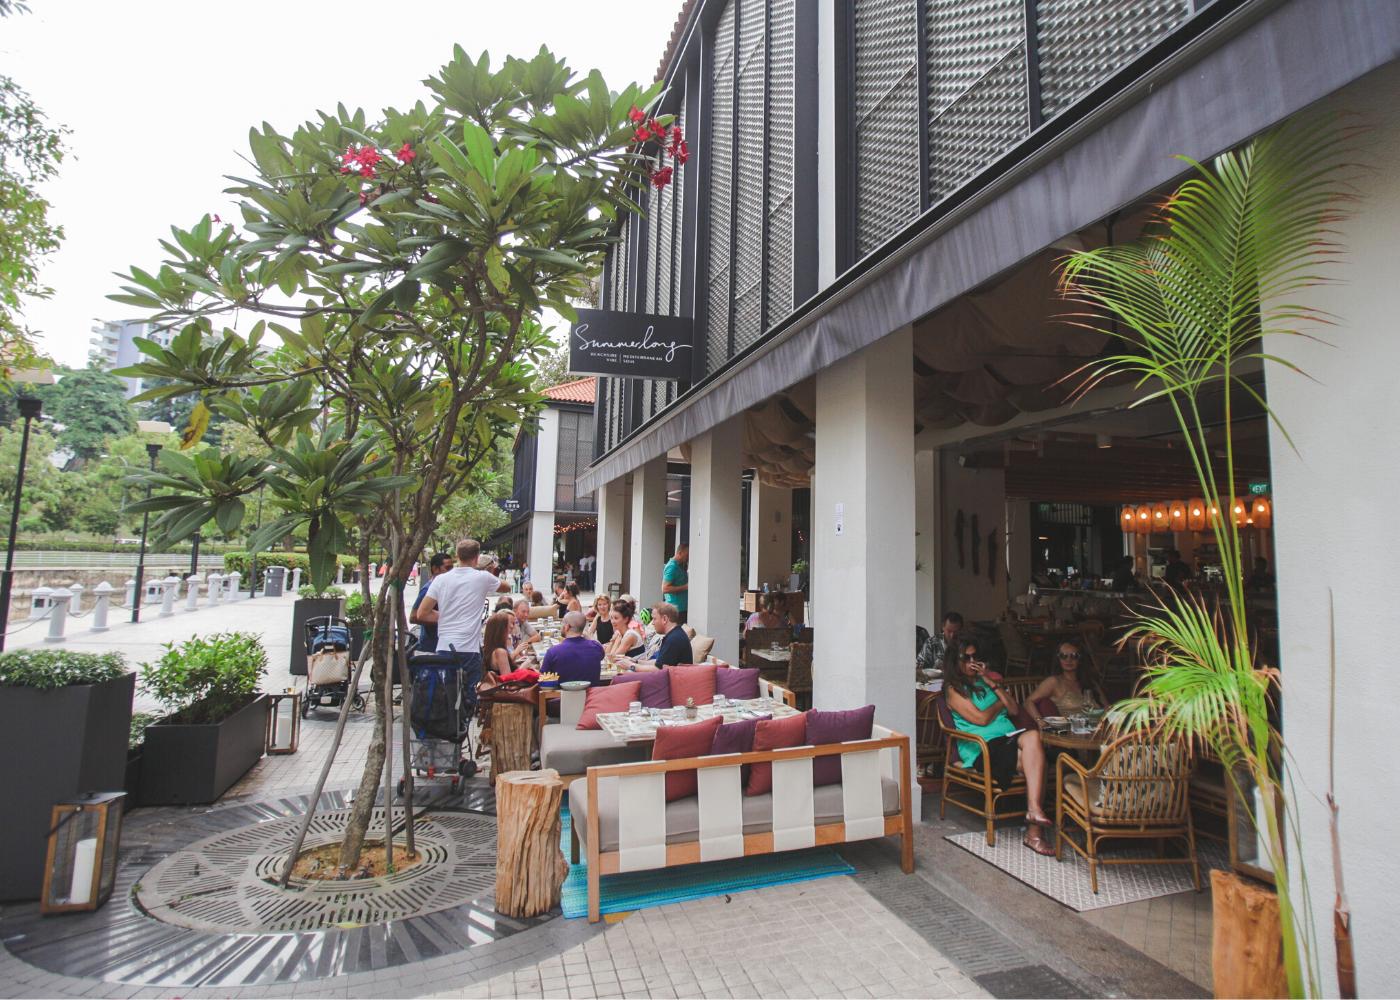 summerlong restaurant | Alfresco dining in Singapore